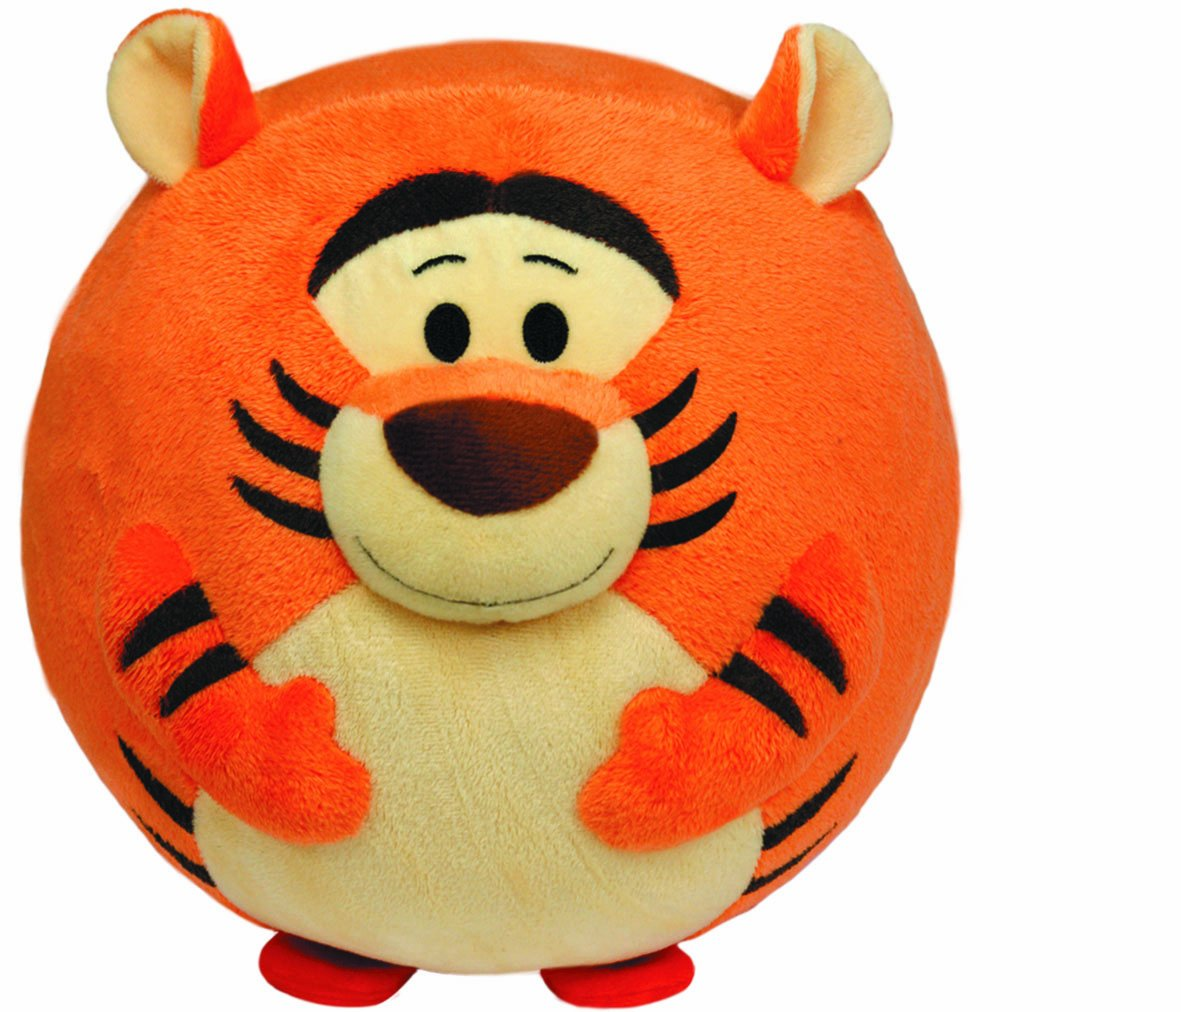 26f73719355 Ty Beanie Ballz Winnie The Pooh Plush